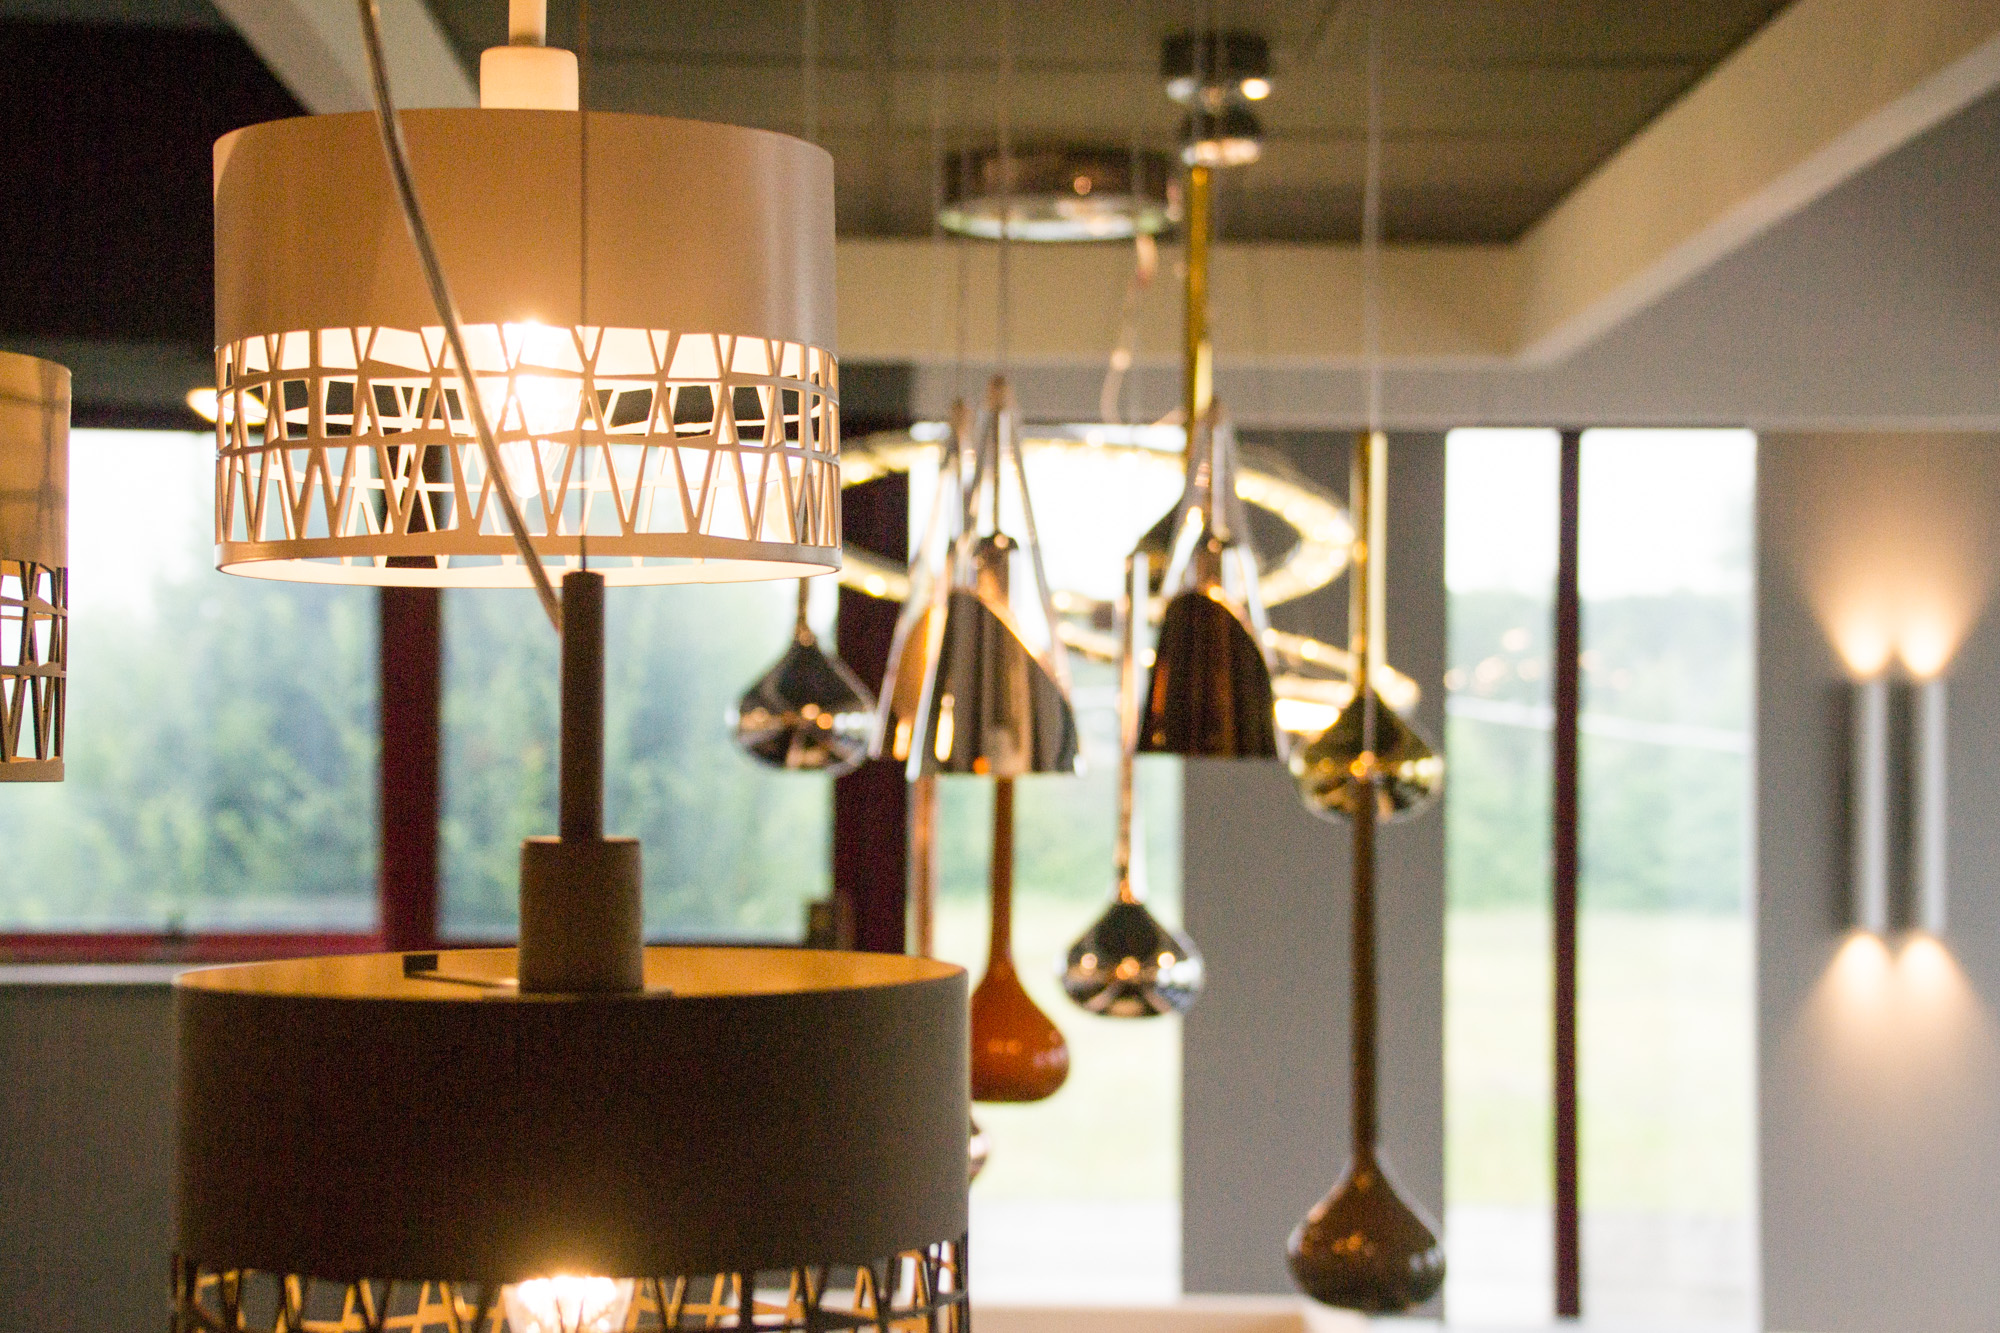 luxury ligh what design director light lighting of engineer new designer is a